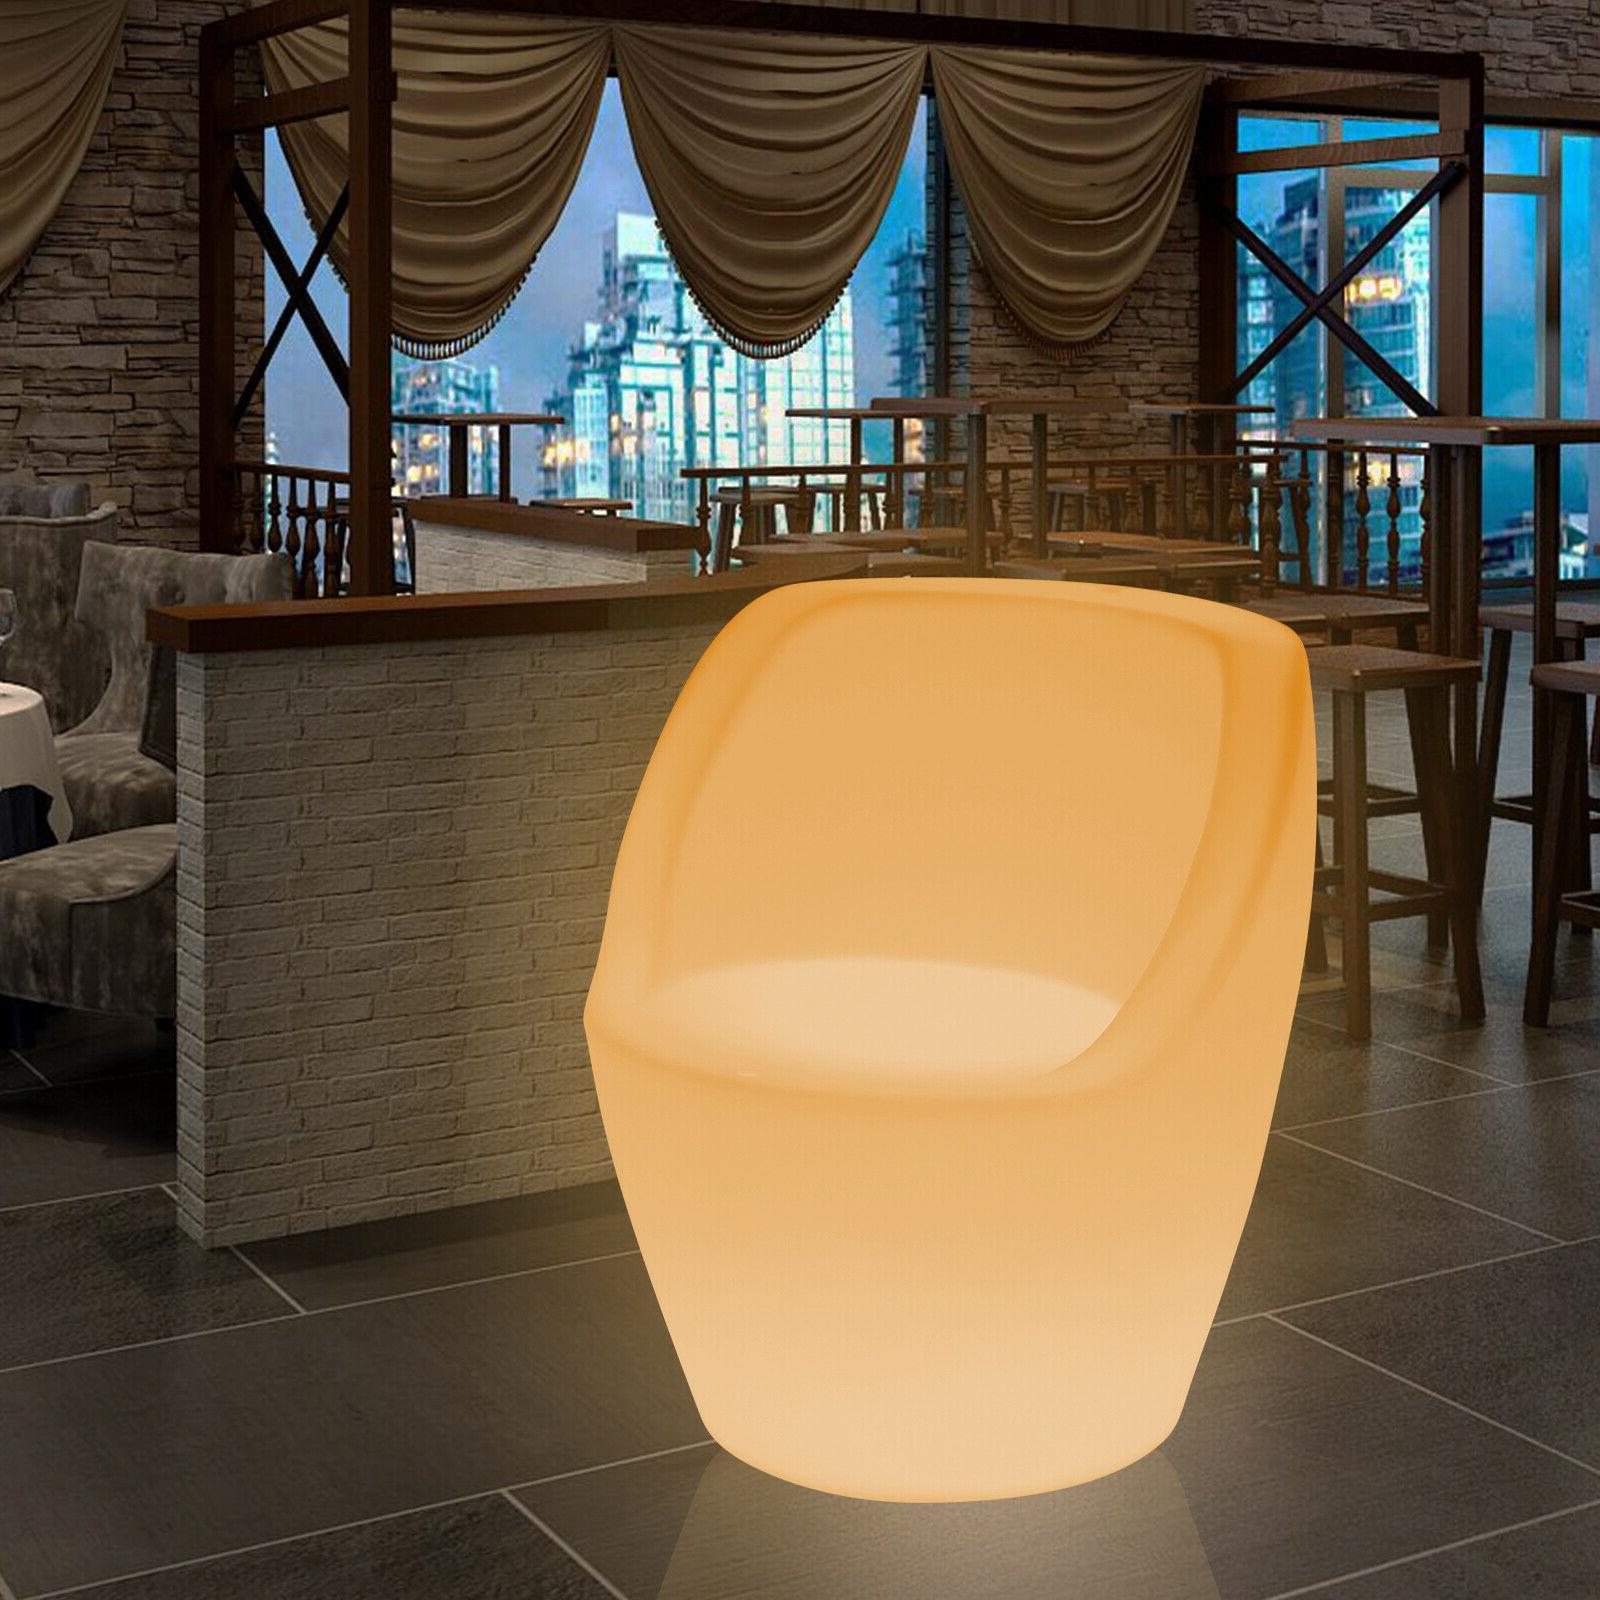 Changing LED Light Up Furniture Lounge Seat